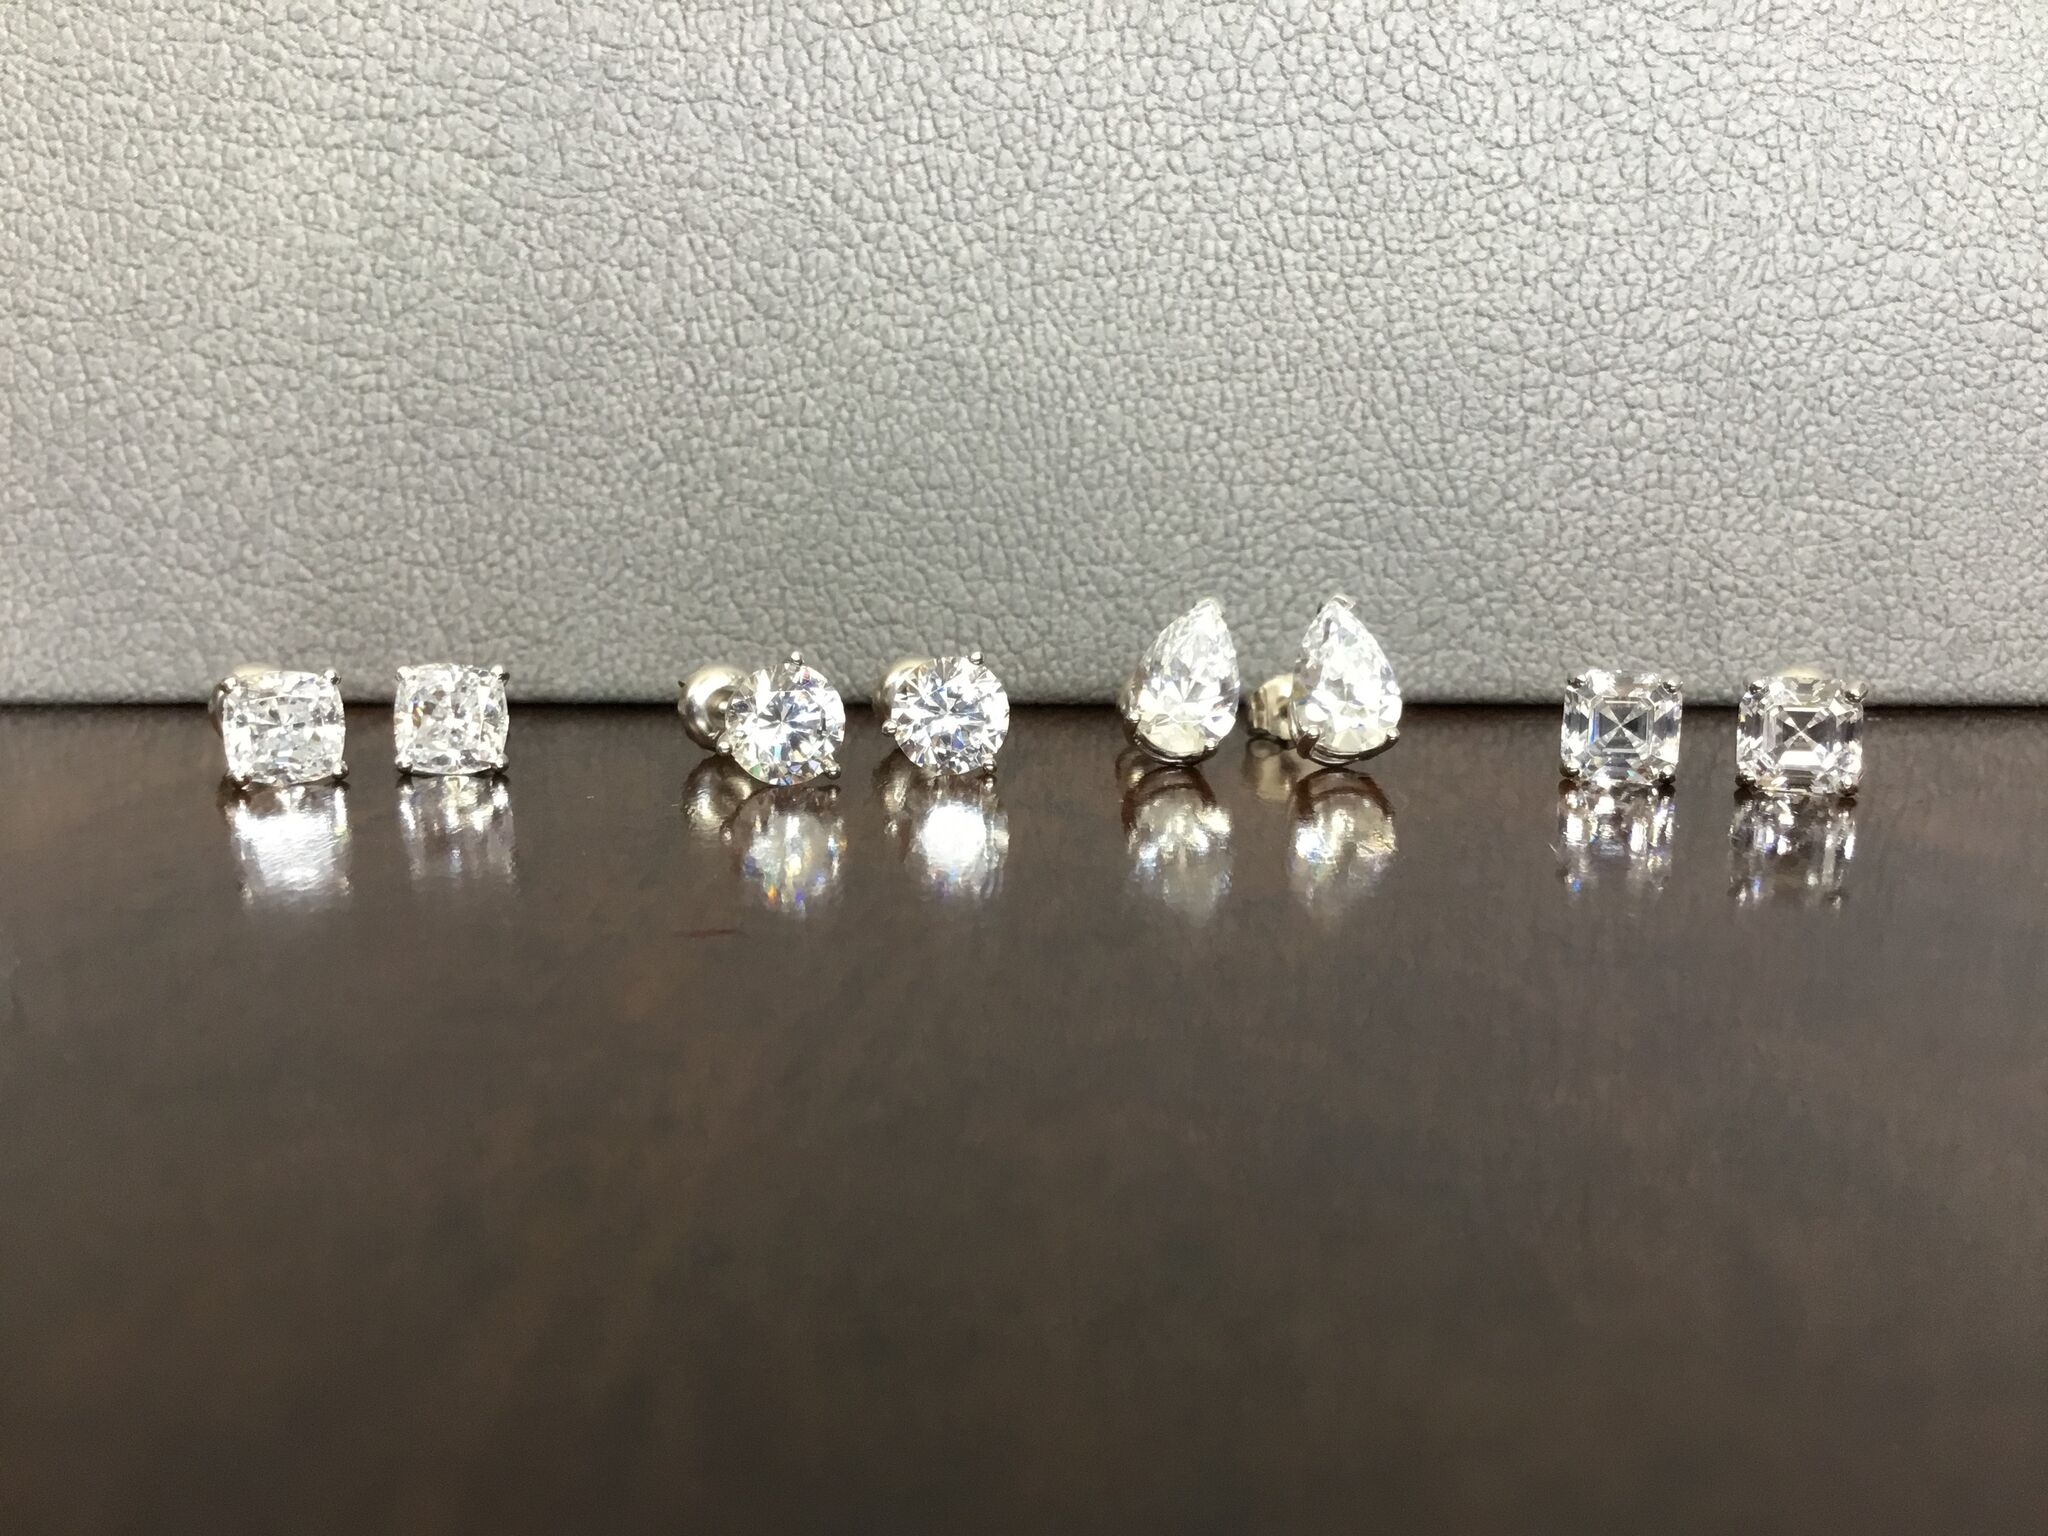 DiamondStuds DiamondStuds NewsDiamondStuds News